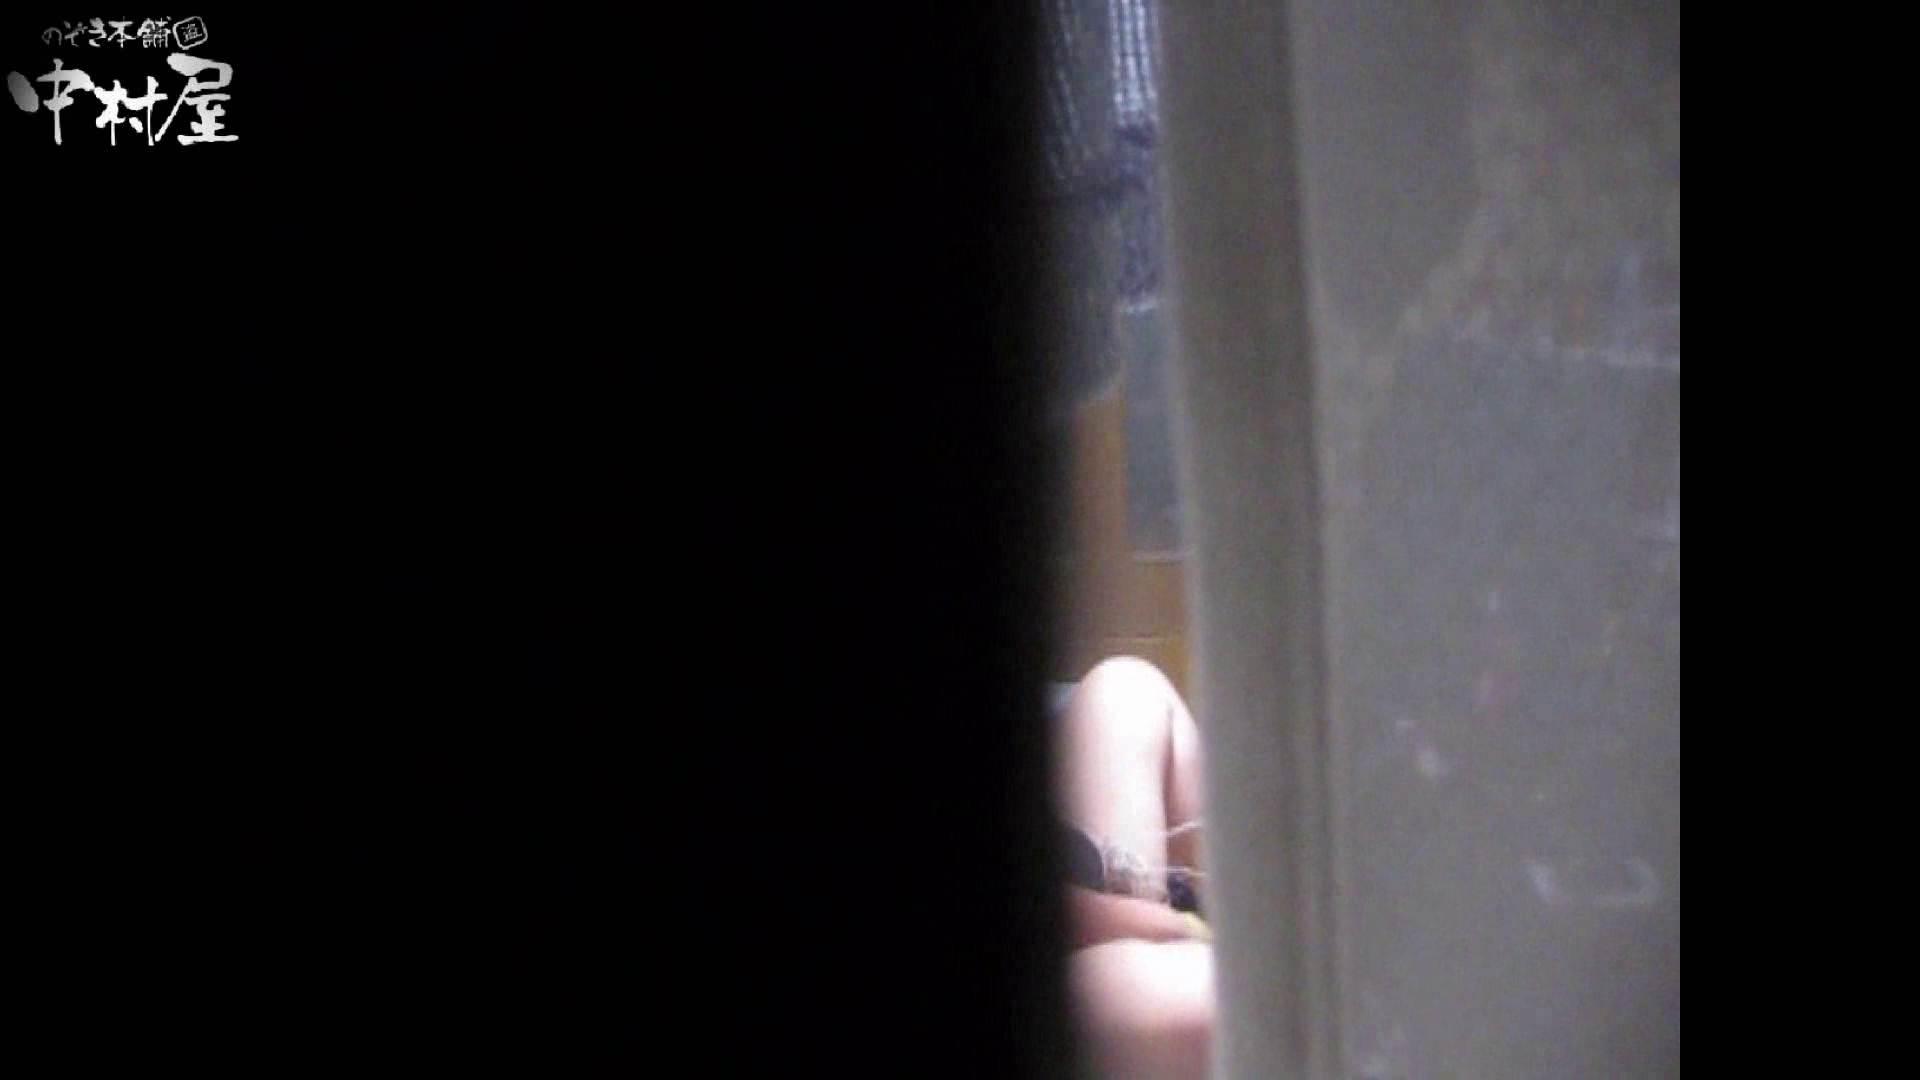 民家風呂専門盗撮師の超危険映像 vol.021 エロい美少女  85PIX 40